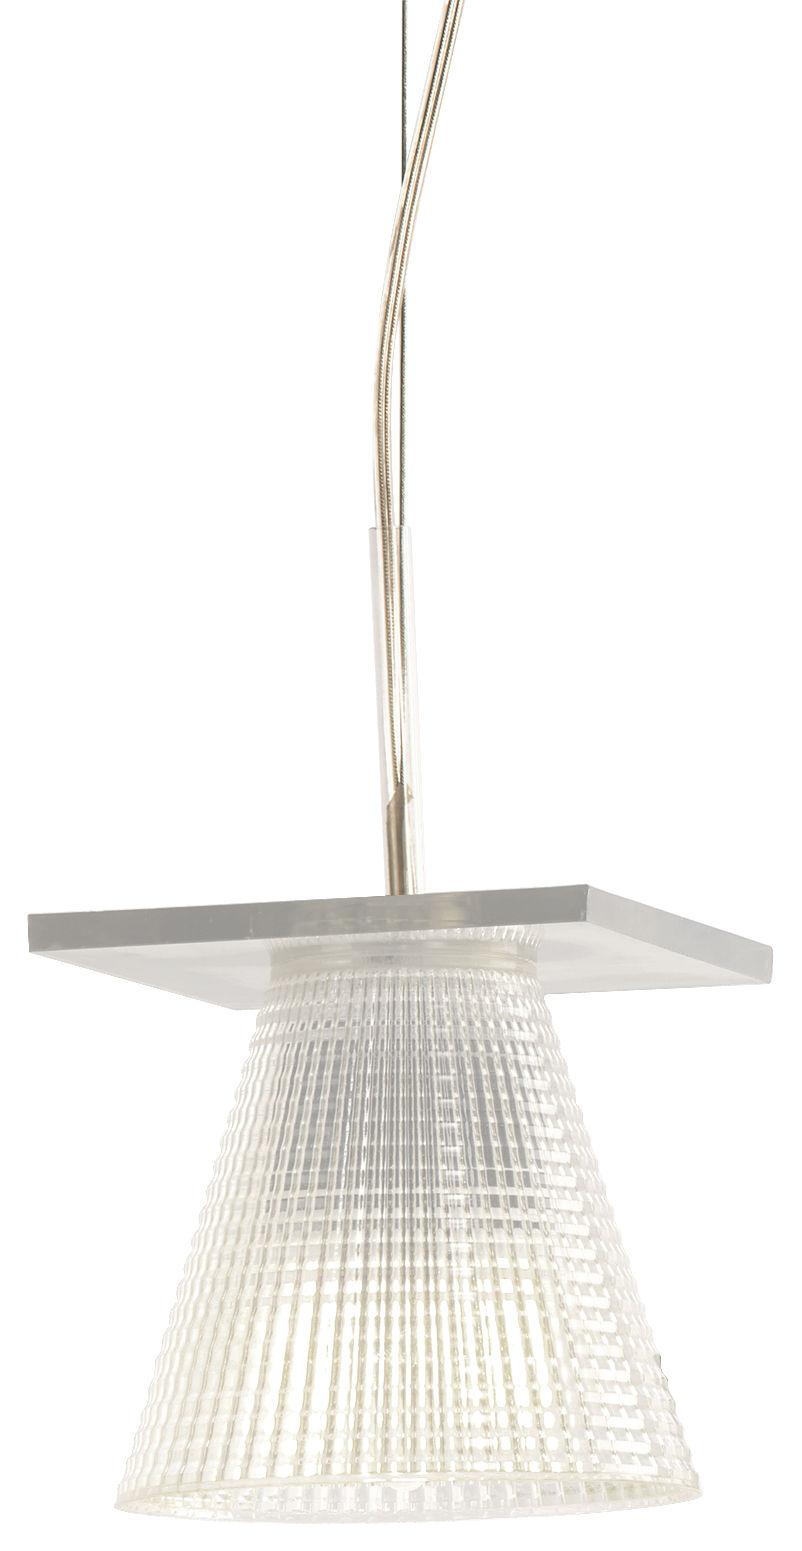 Leuchten - Pendelleuchten - Light-Air Pendelleuchte / Lampenschirm aus Kunststoff - Kartell - Transparent (farblos) - Technopolymère thermoplastique